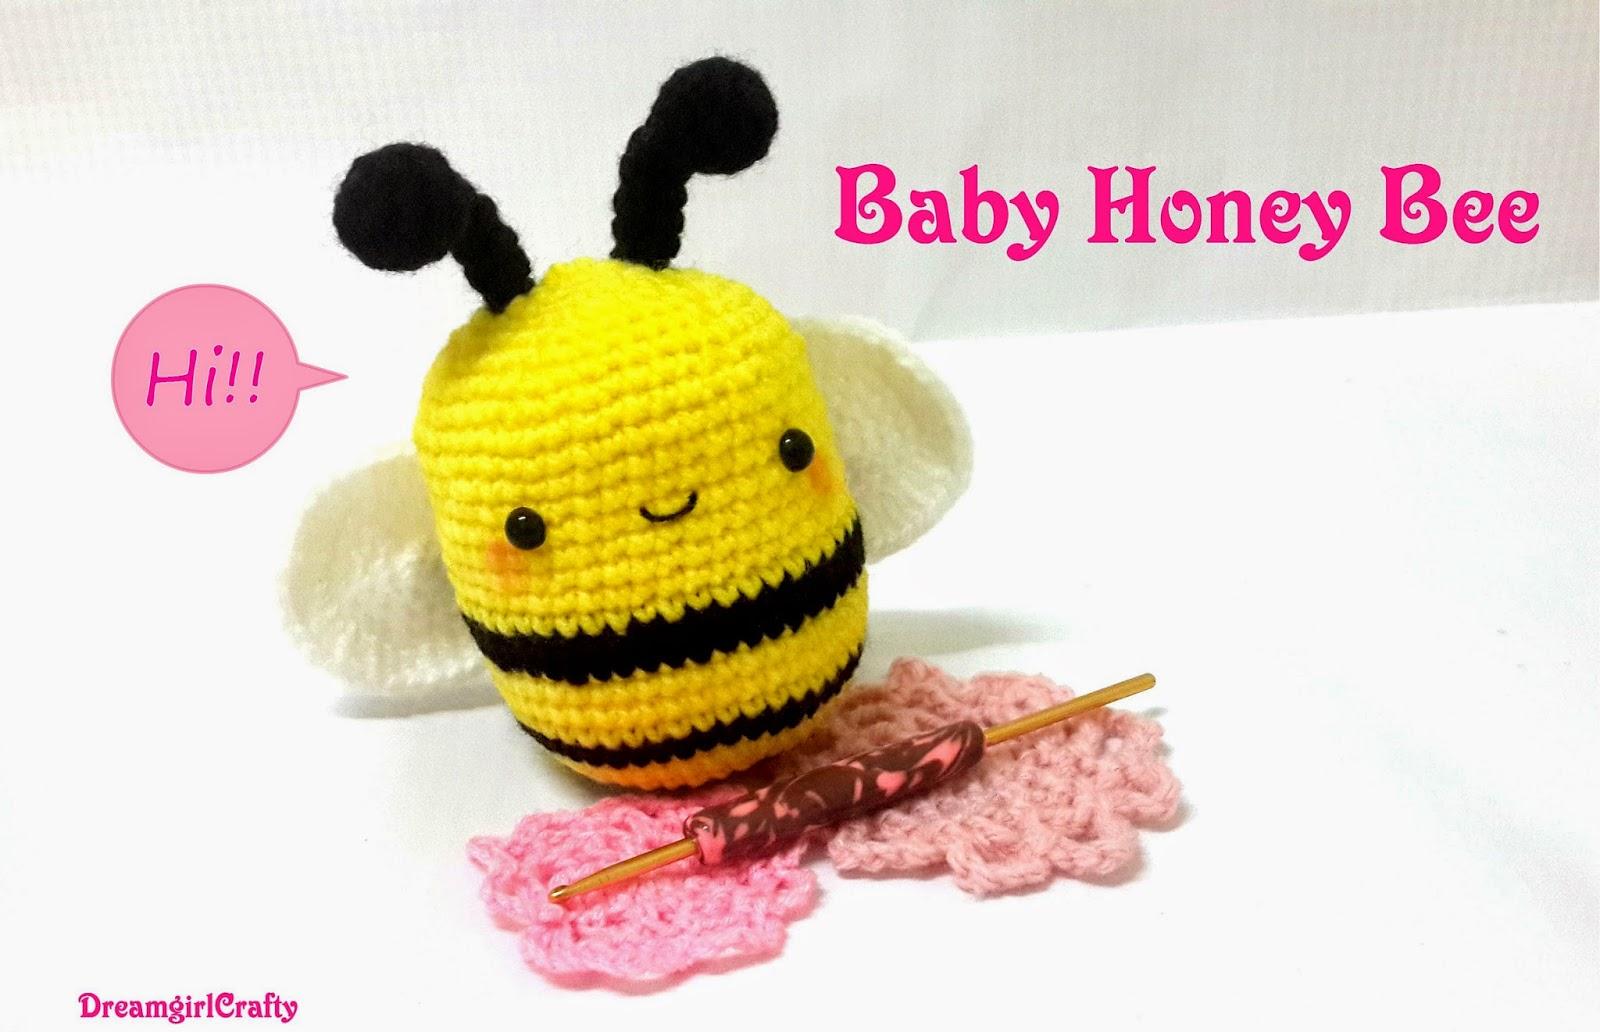 Dreamy Kawaii Crafts Creations : Baby Honey Bee Free Pattern